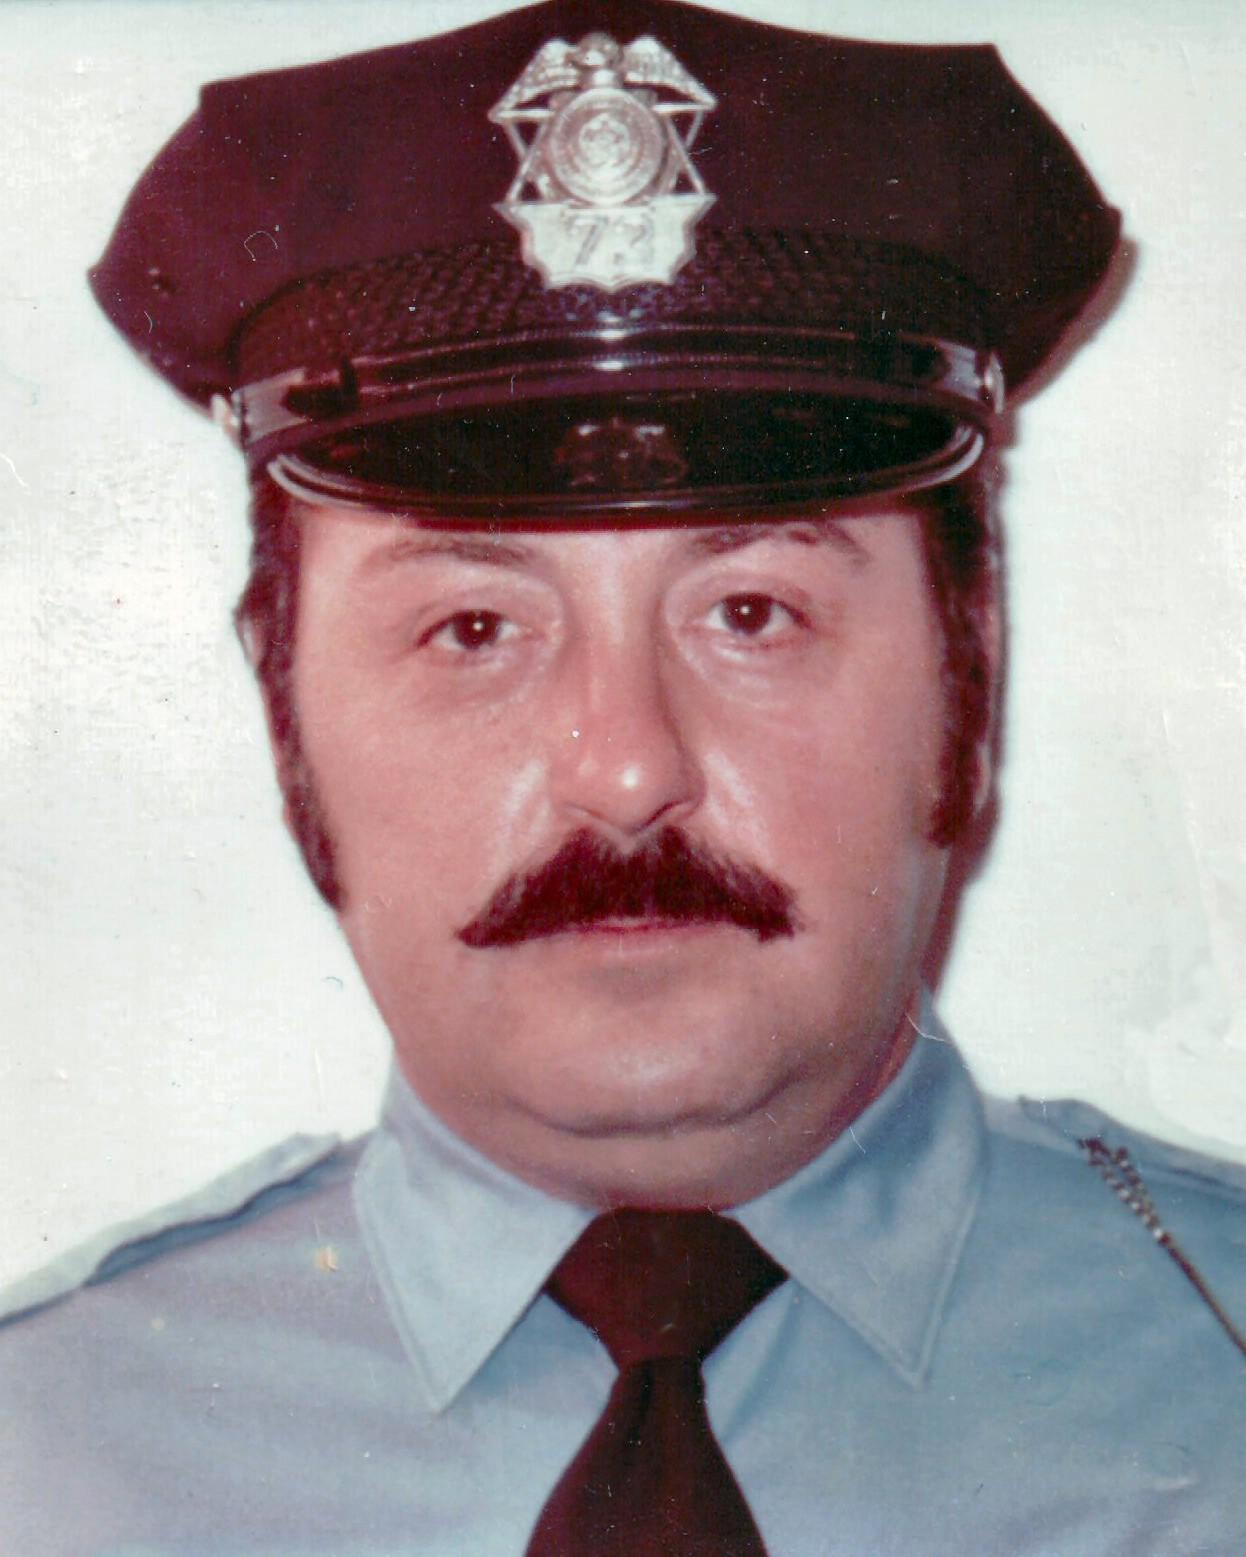 Sergeant Michael Steven Monoc | Sharon Police Department, Pennsylvania